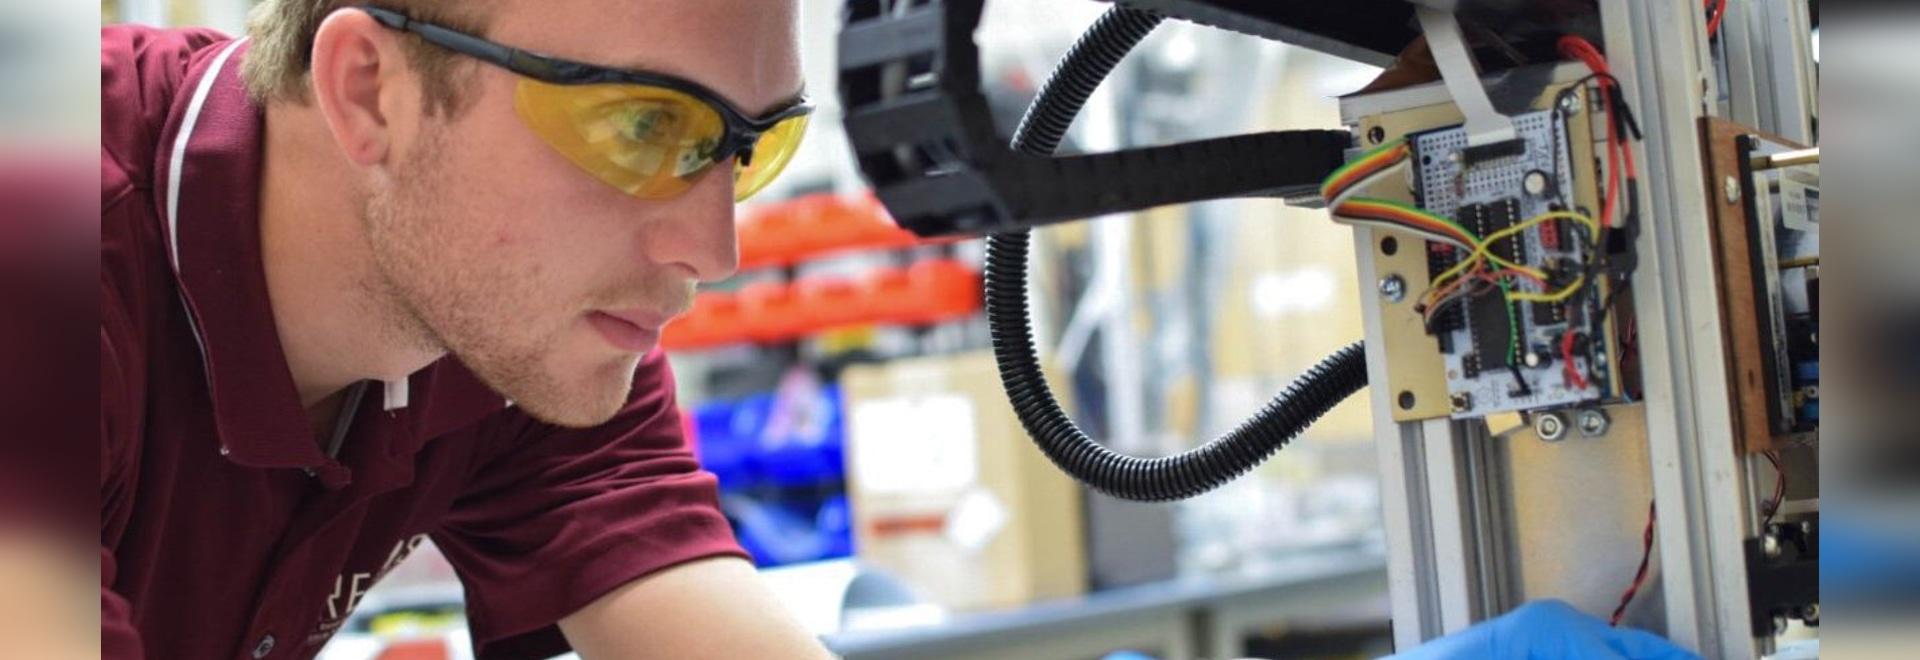 Daniel Rau works with a 3D printer in the DREAMS Lab.